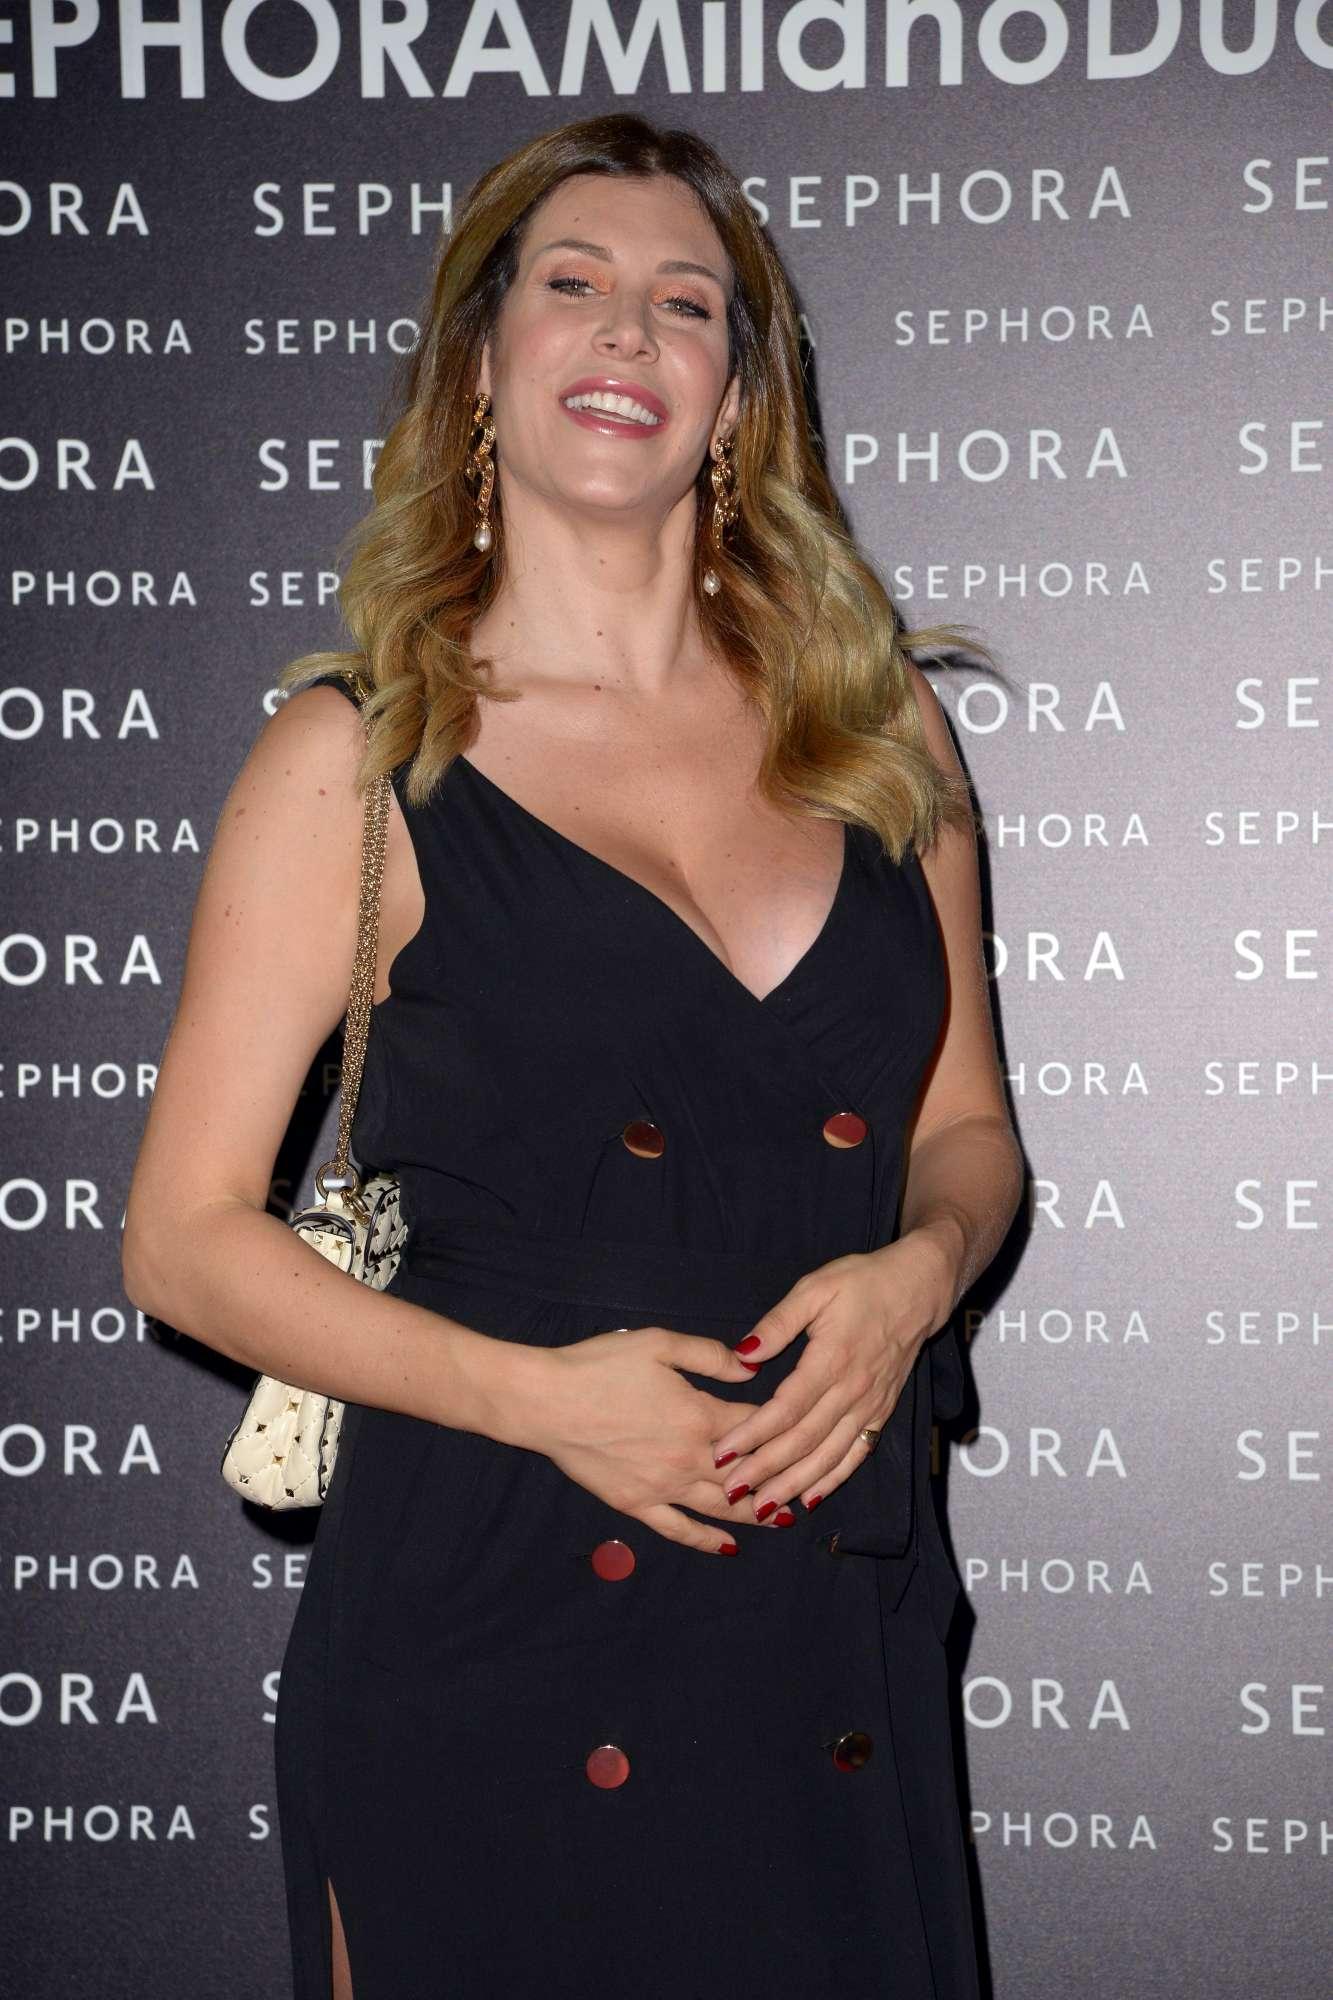 Paola Caruso, l ex Bonas e ex naufraga sfila col pancione a Milano